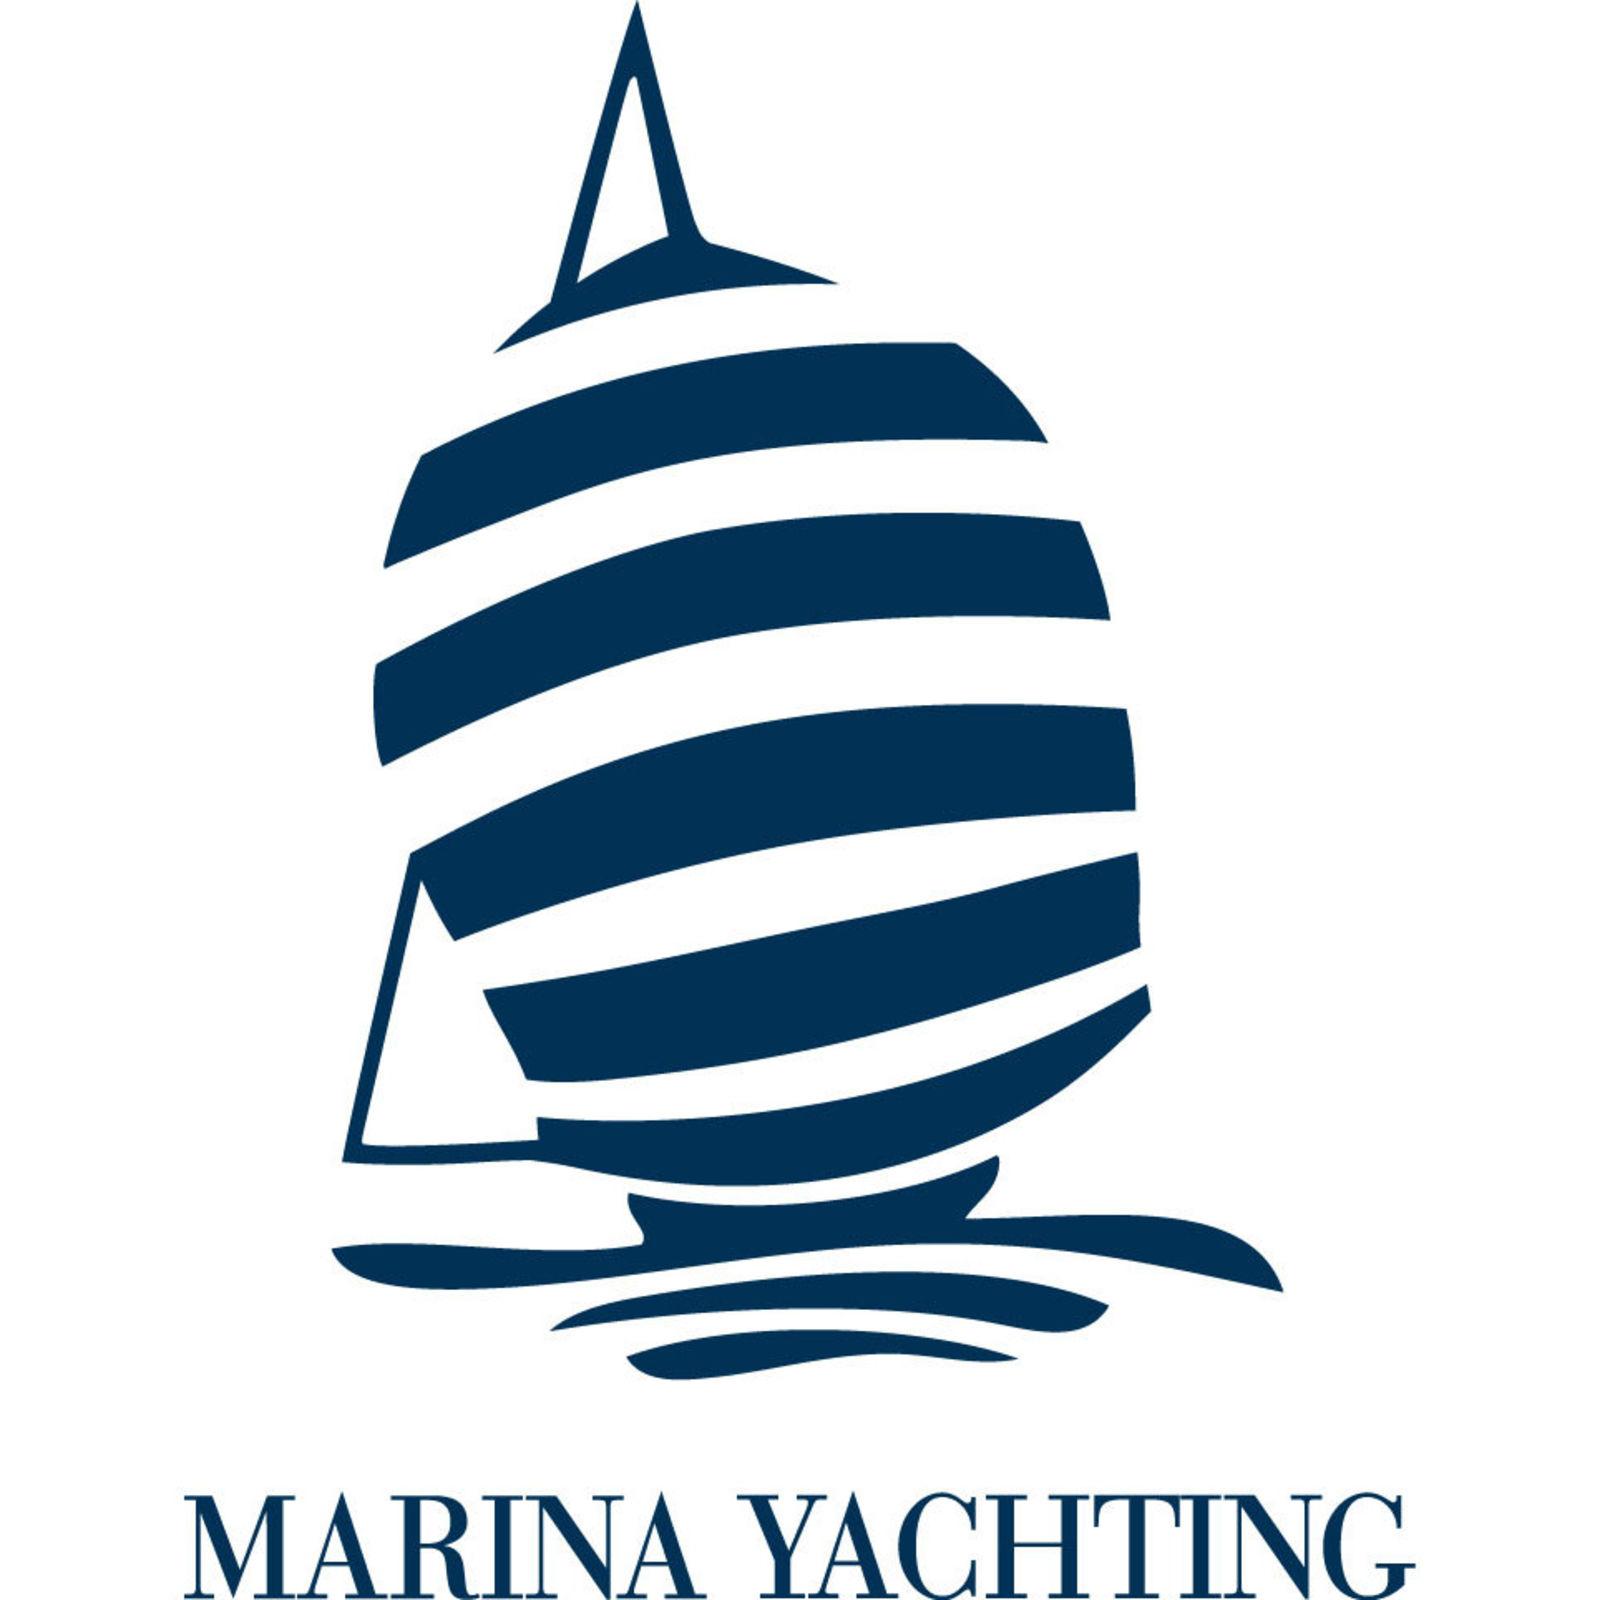 MARINA YACHTING